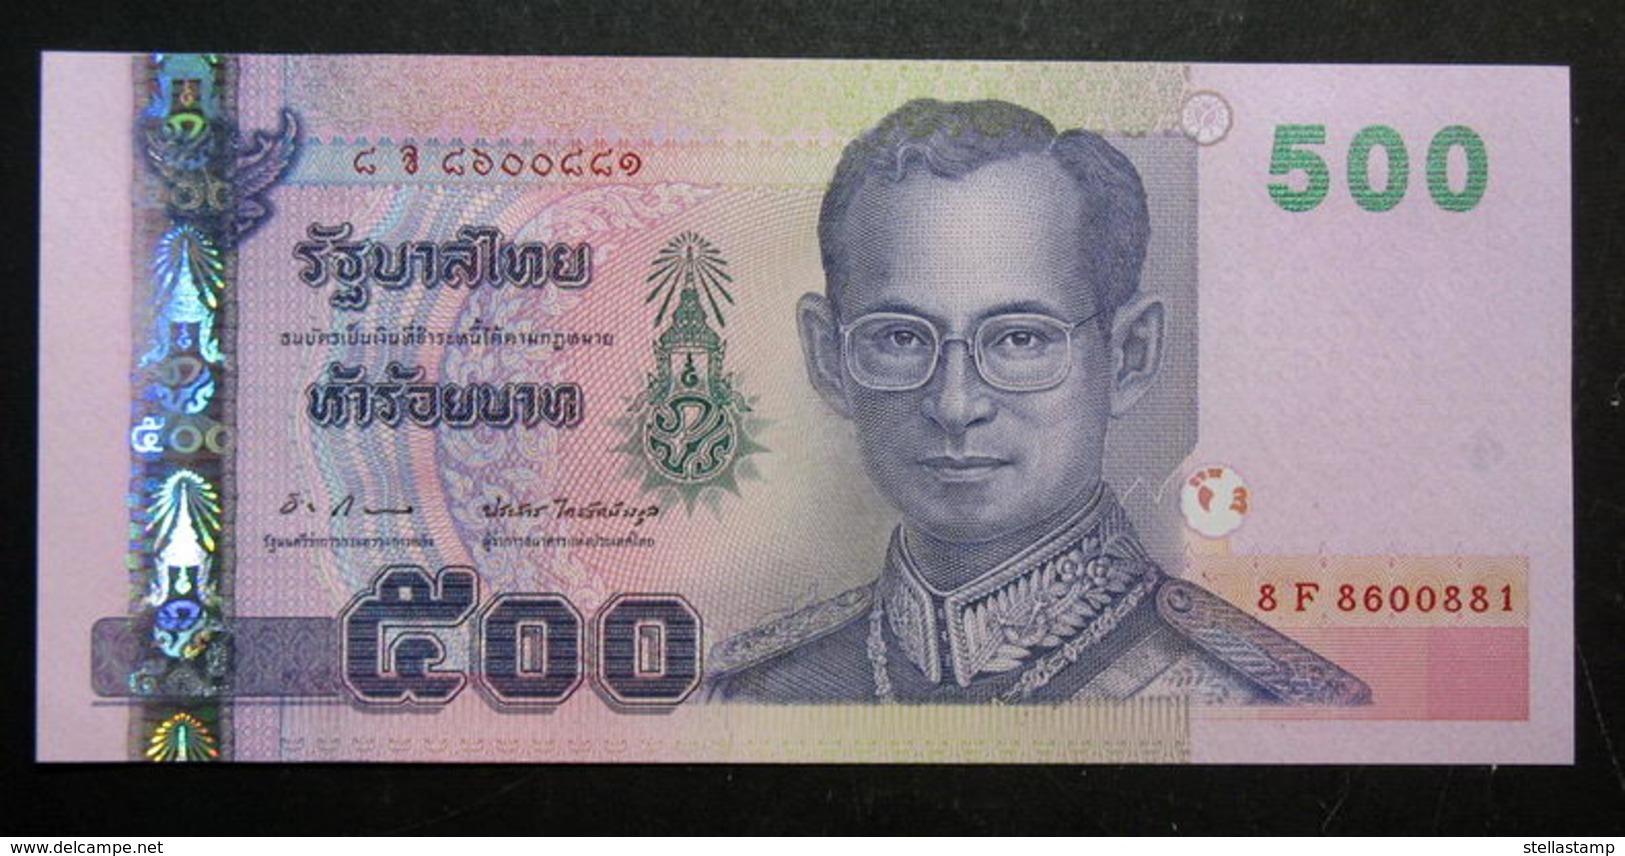 Thailand Banknote 500 Baht Series 15 P#107 SIGN#83 UNC - Thailand